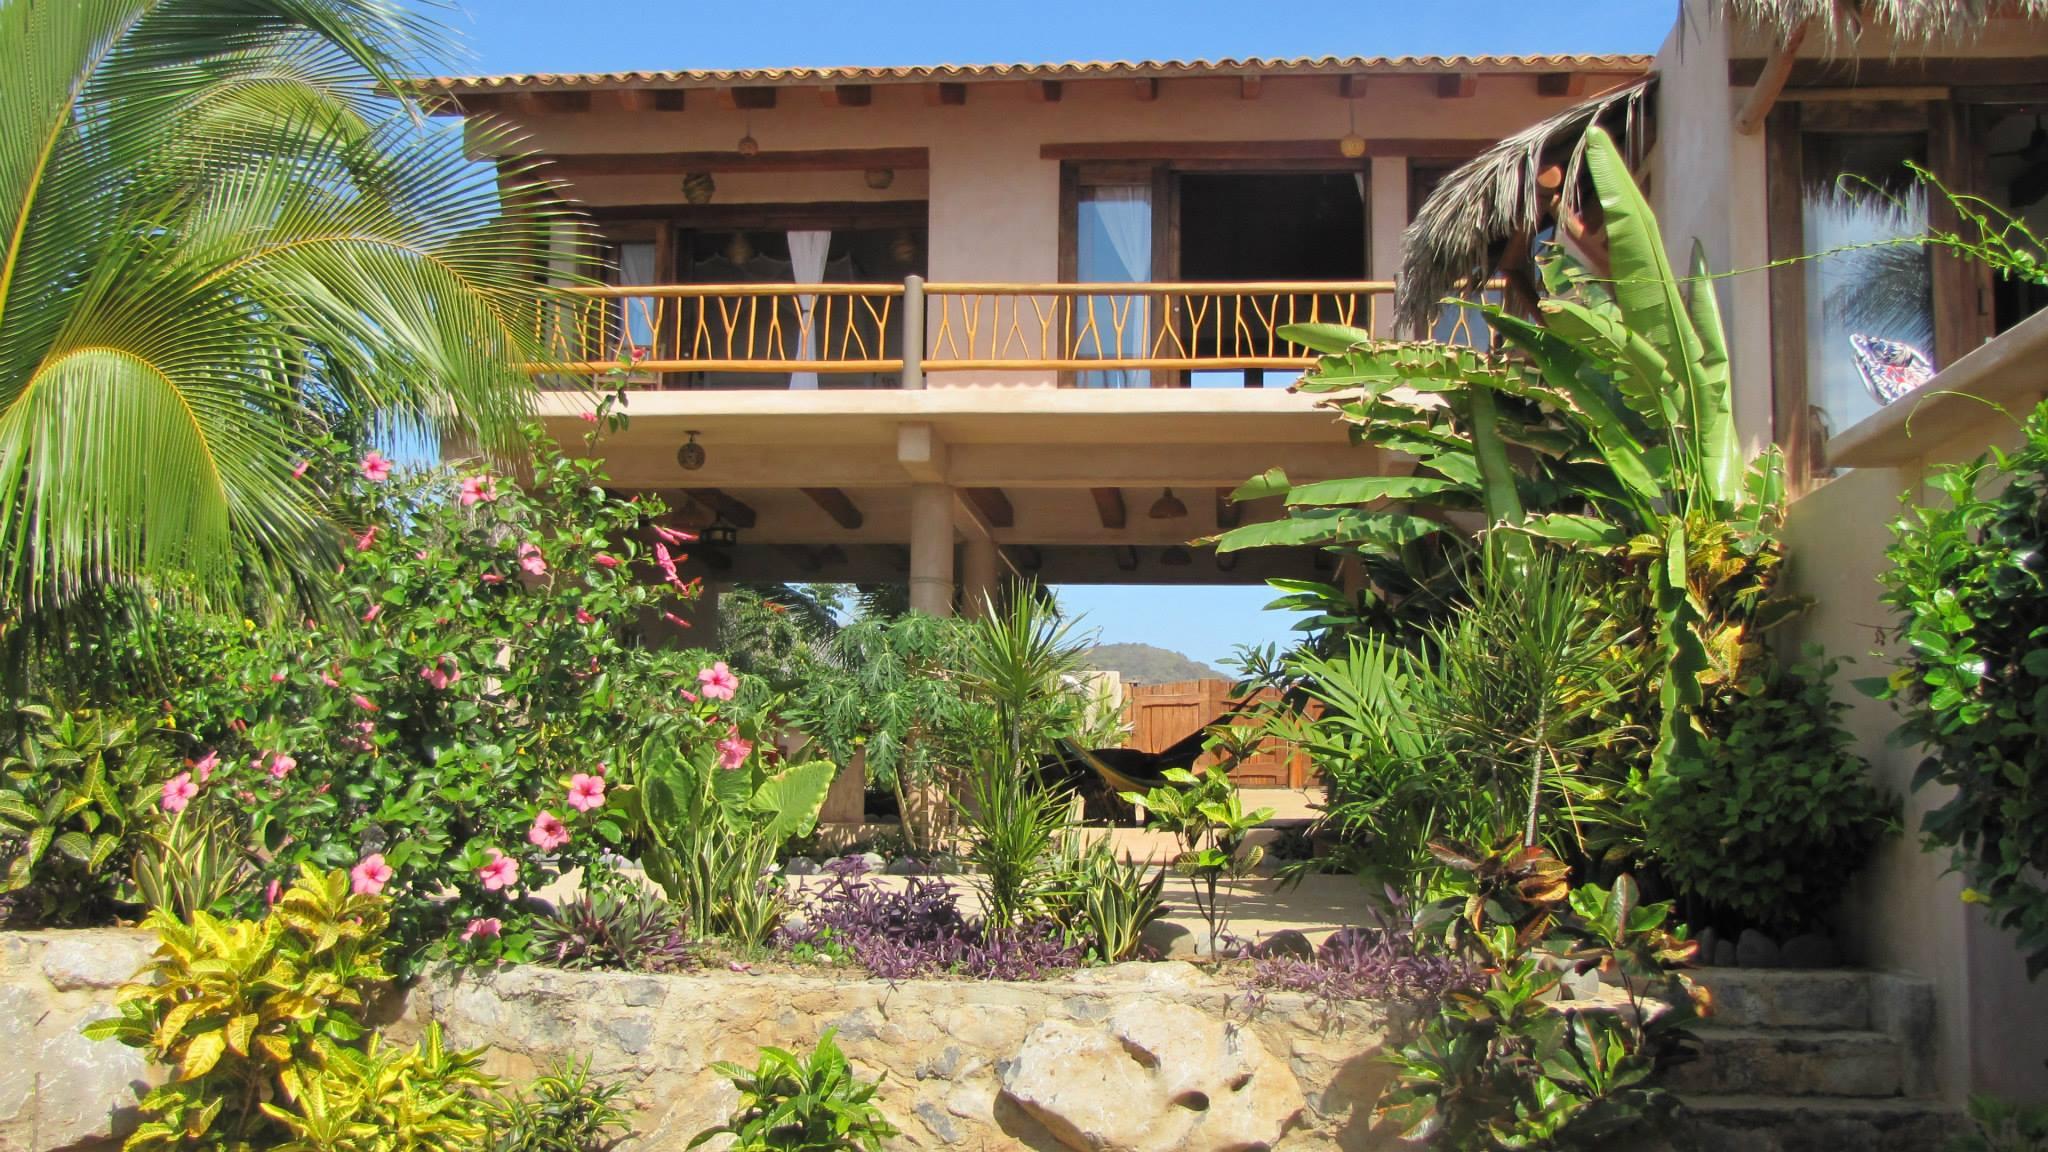 discover troncones saladita majahua mexico playa reservaciones hospedaje ixtapa guerrero travel near me booking hotel cheap hotel